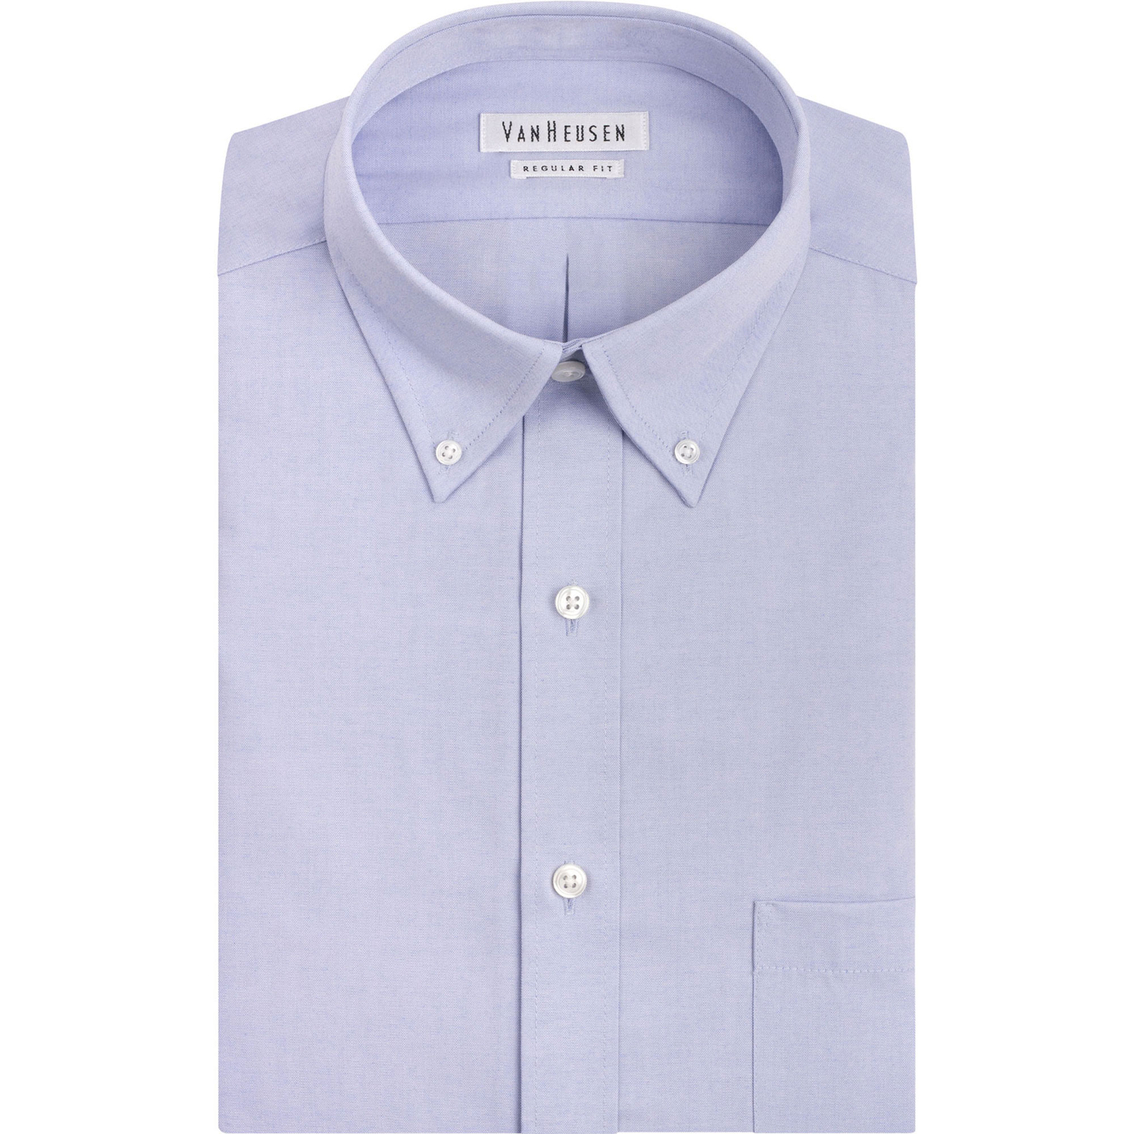 van heusen pinpoint dress shirt dress shirts apparel